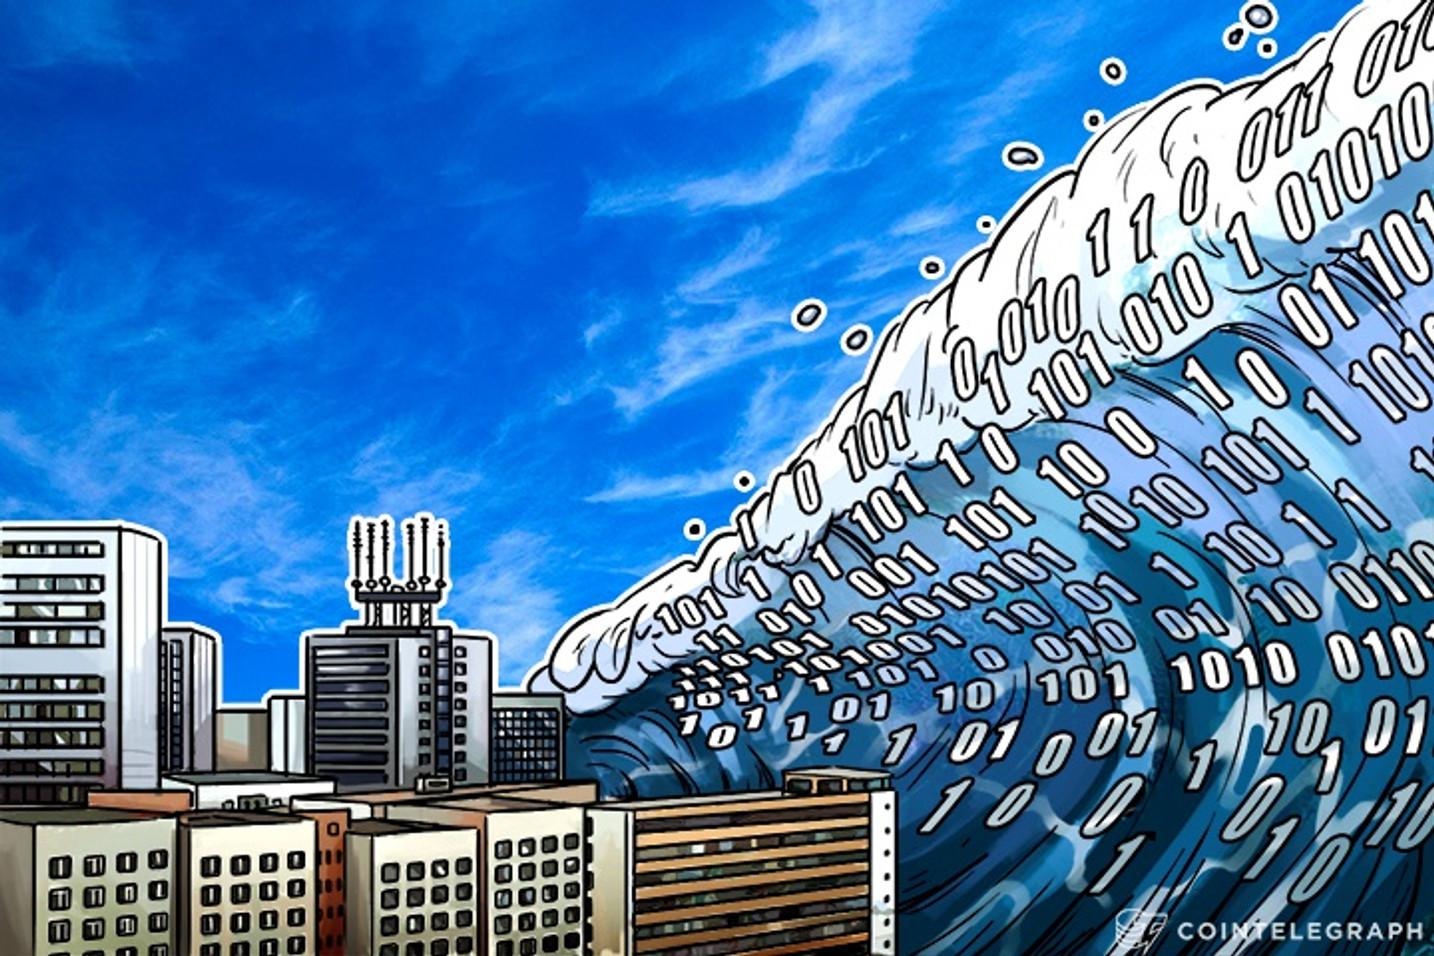 Blockchain Is 2016's Biggest Tsunami Says Major Software Company